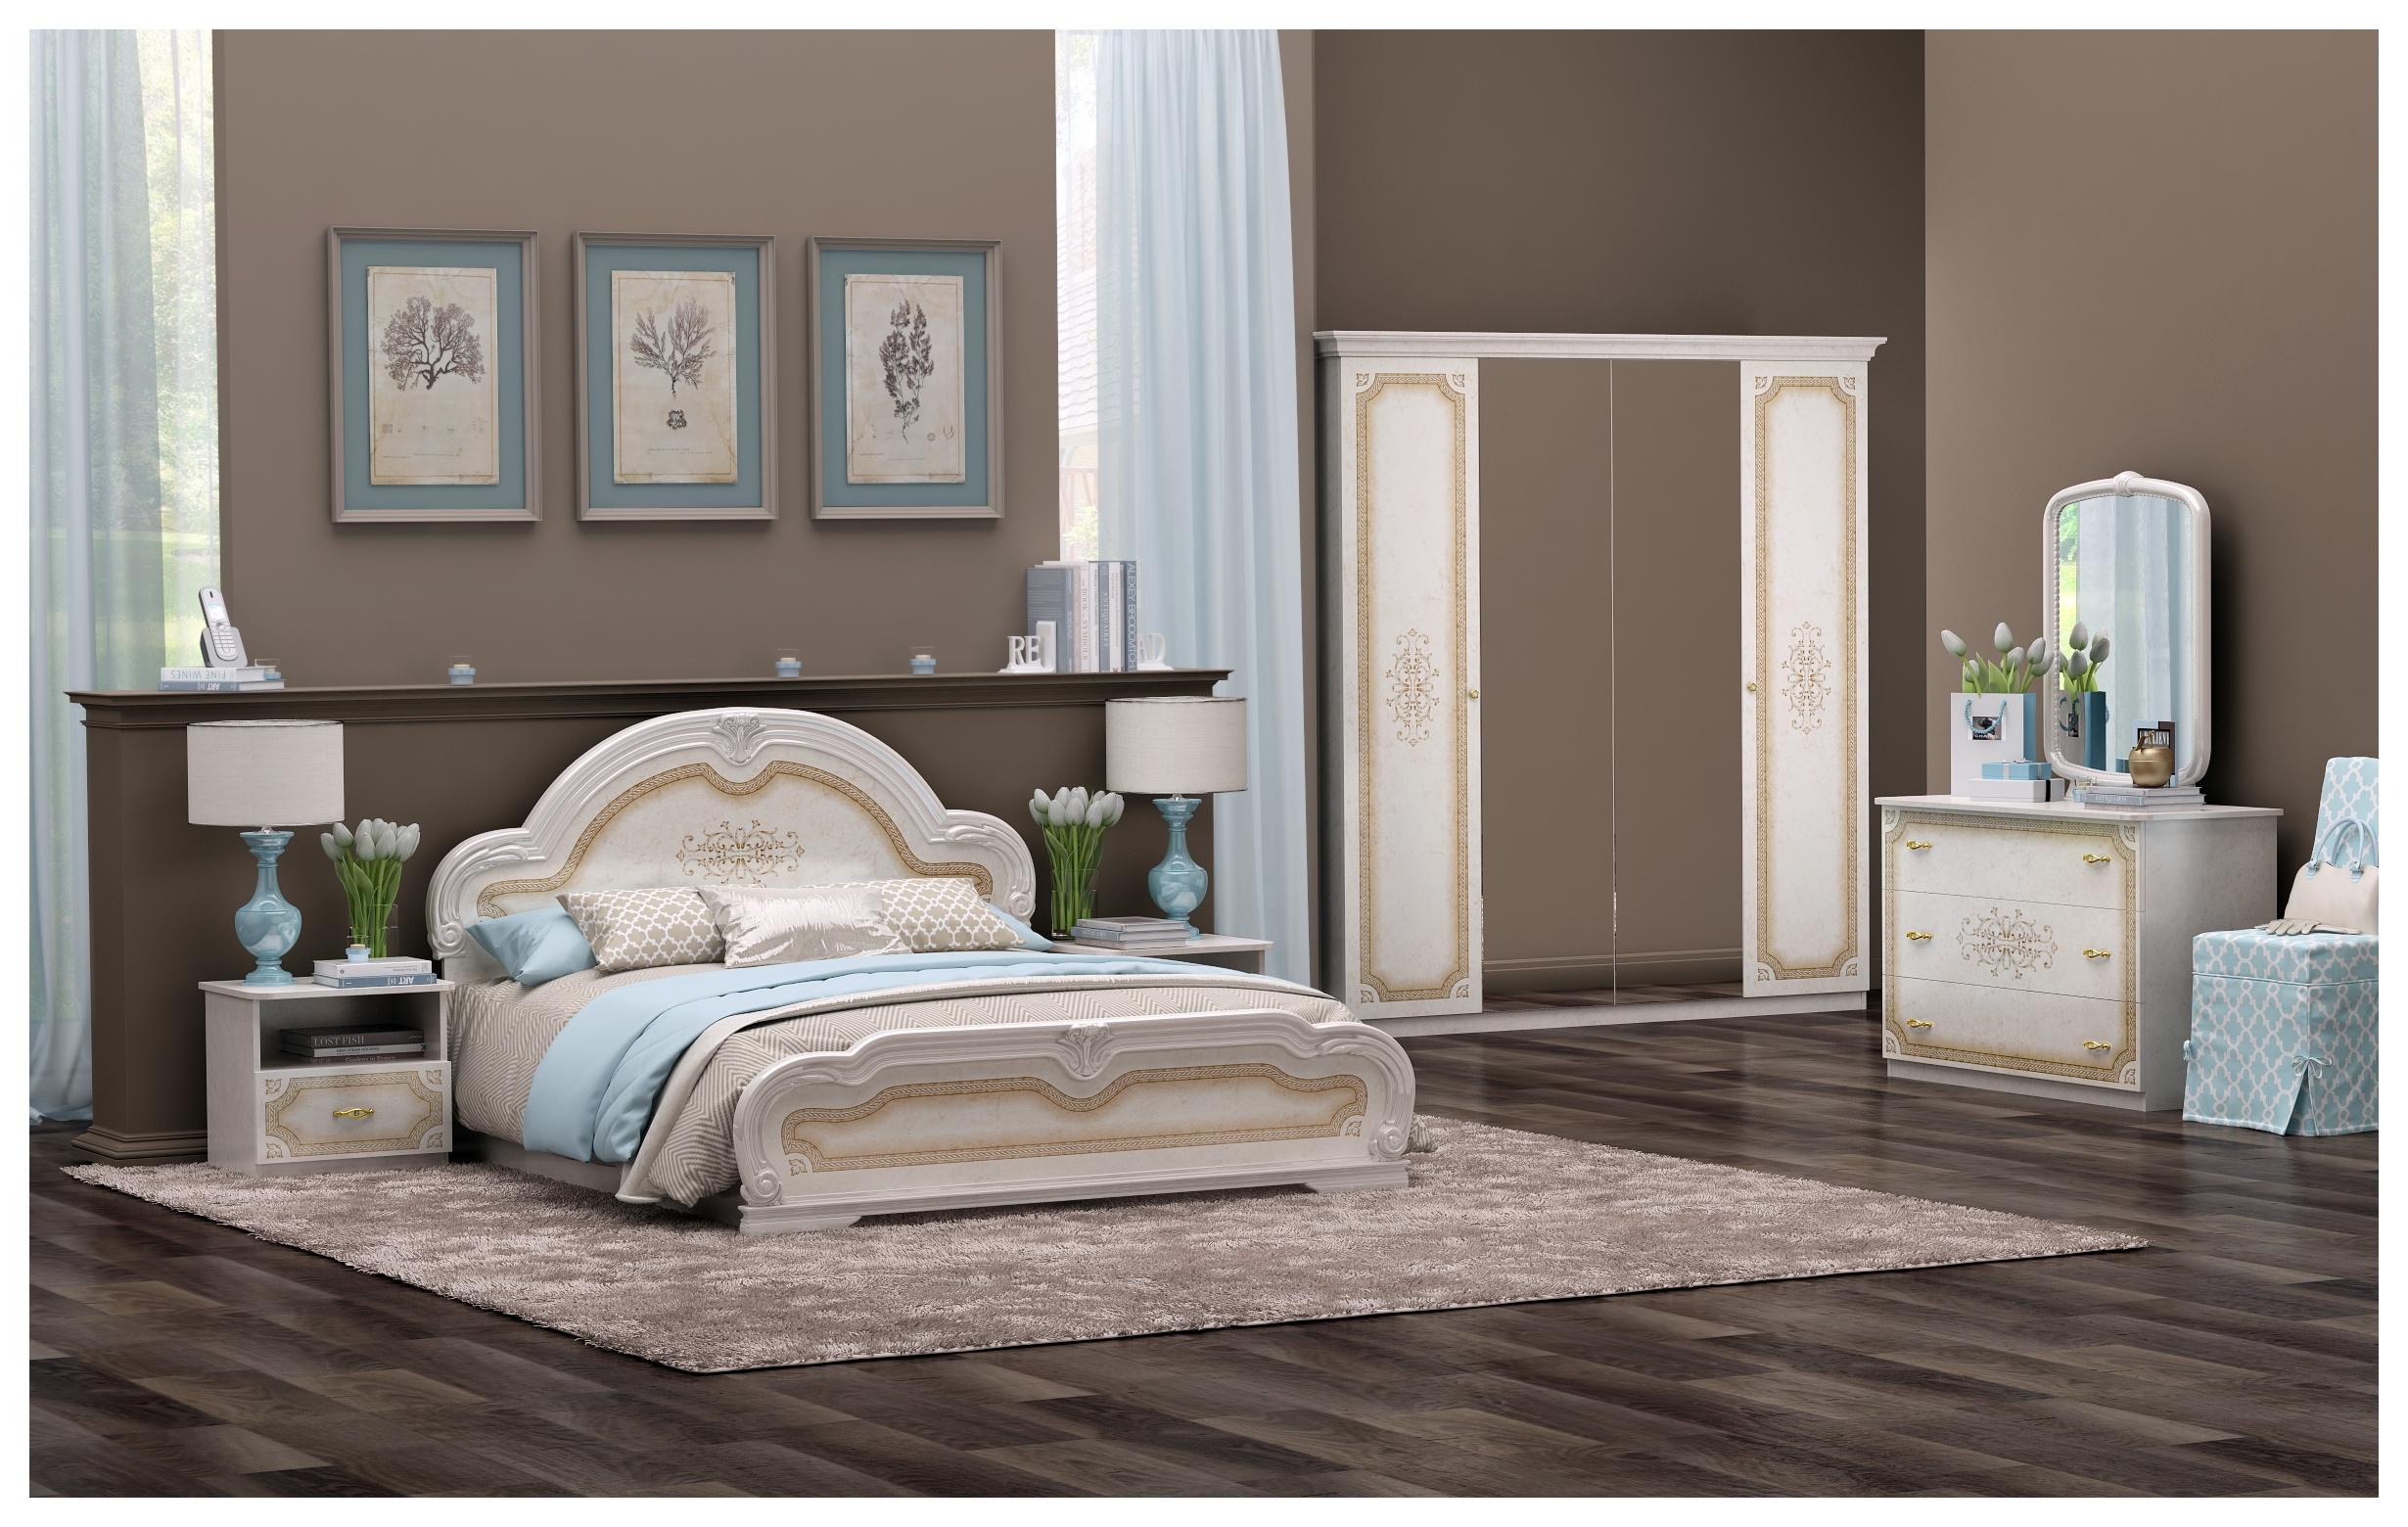 Спальня Элена - фото